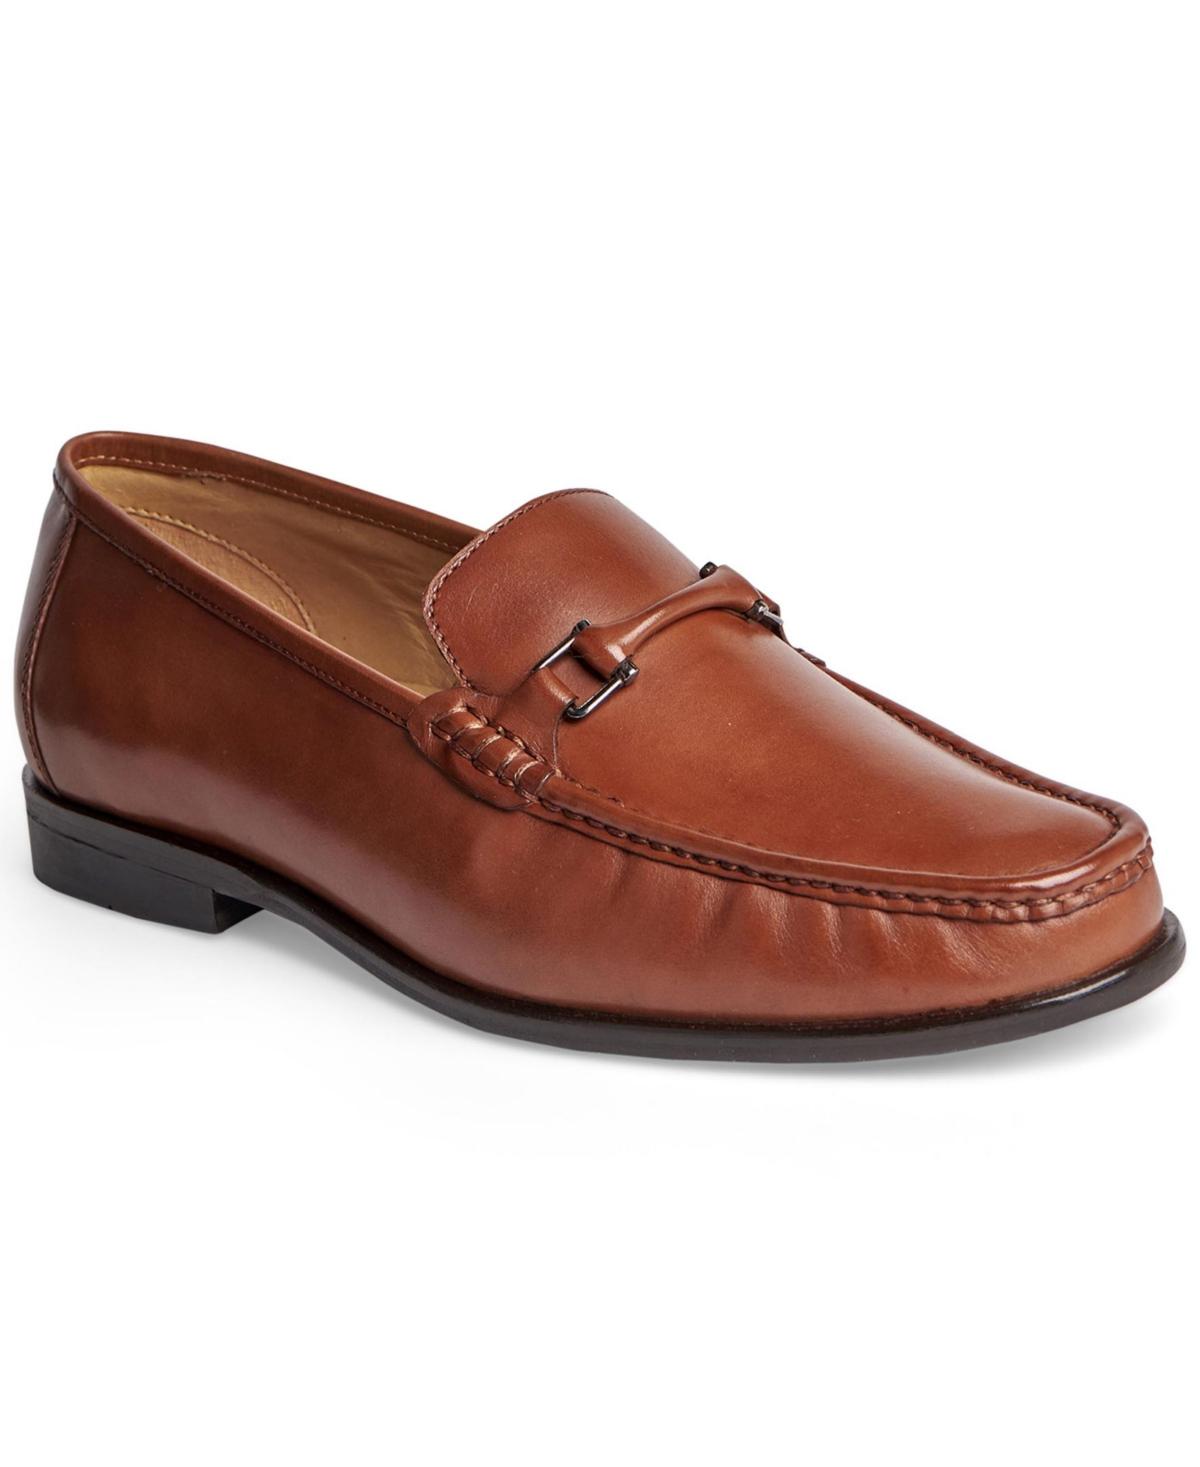 Men's Milagro Bit Casual Slip-On Loafer Men's Shoes